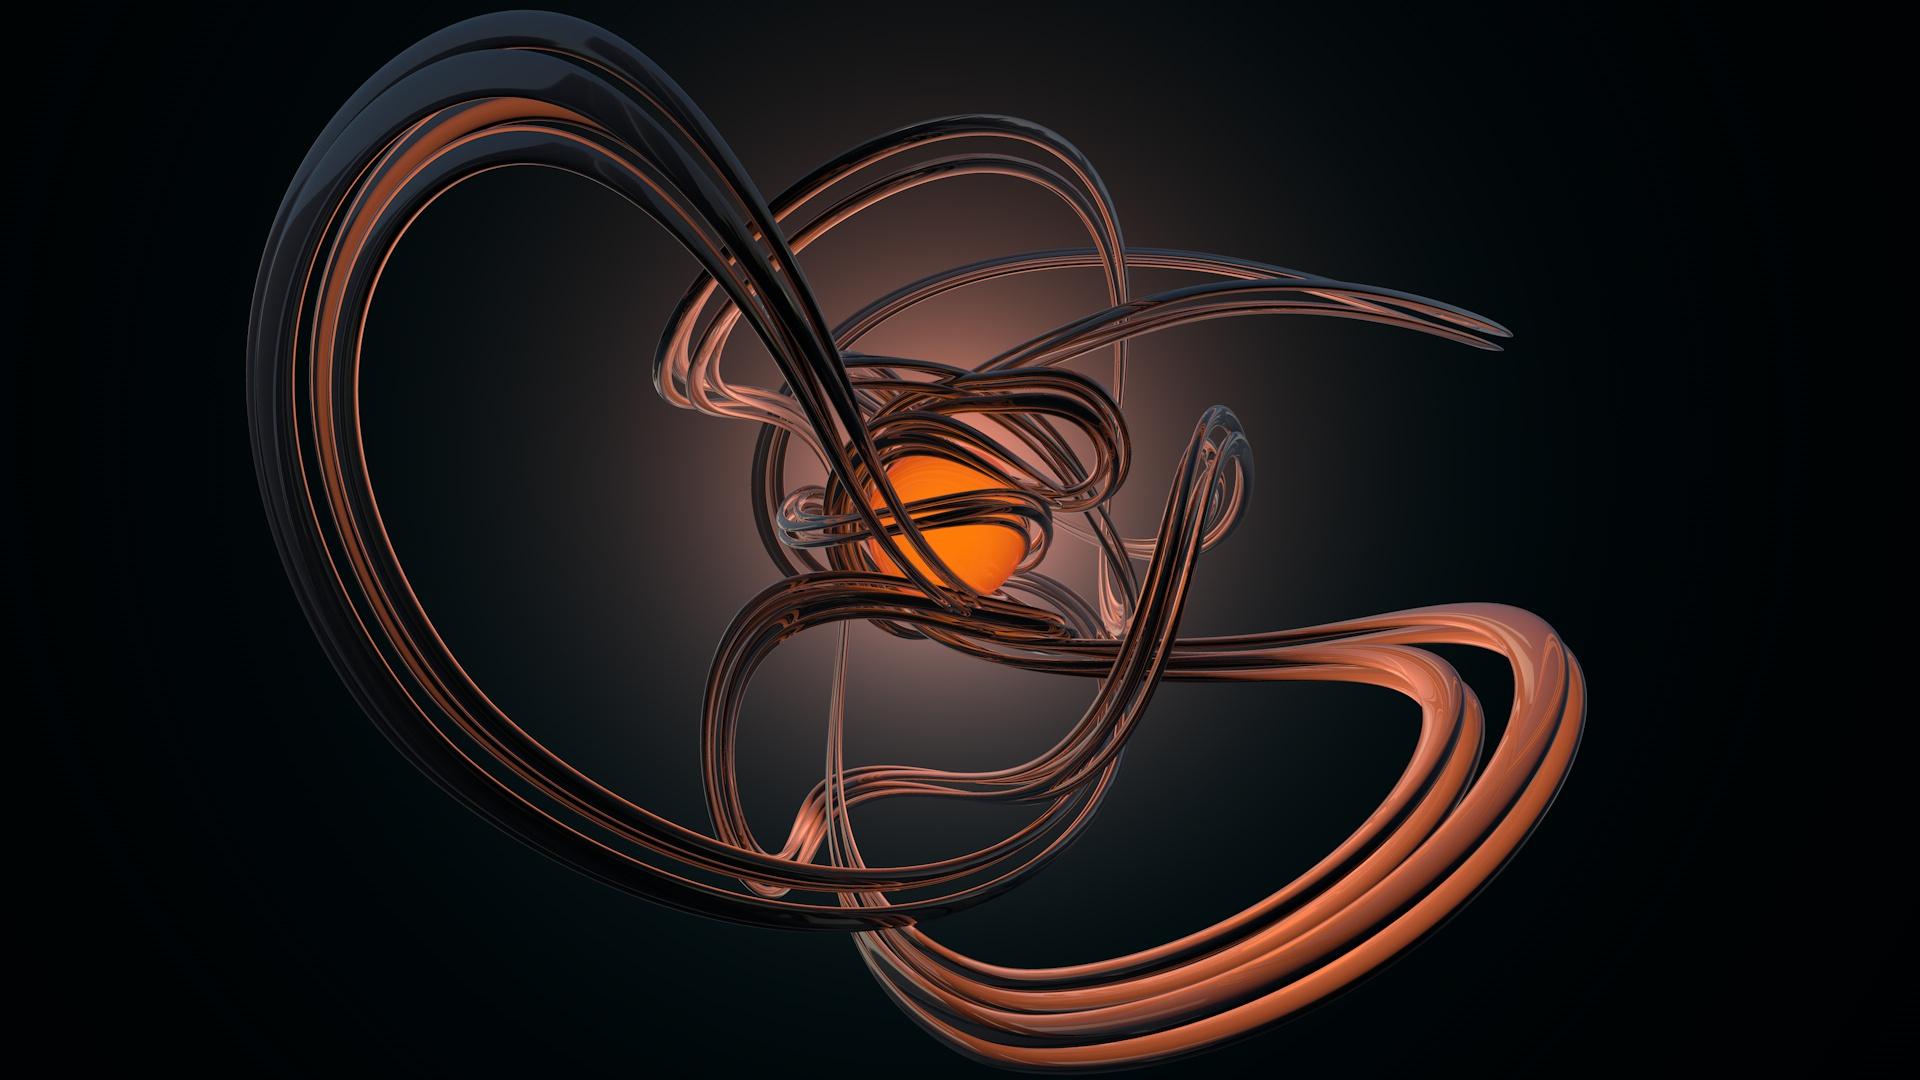 Intensity by KRYPT06